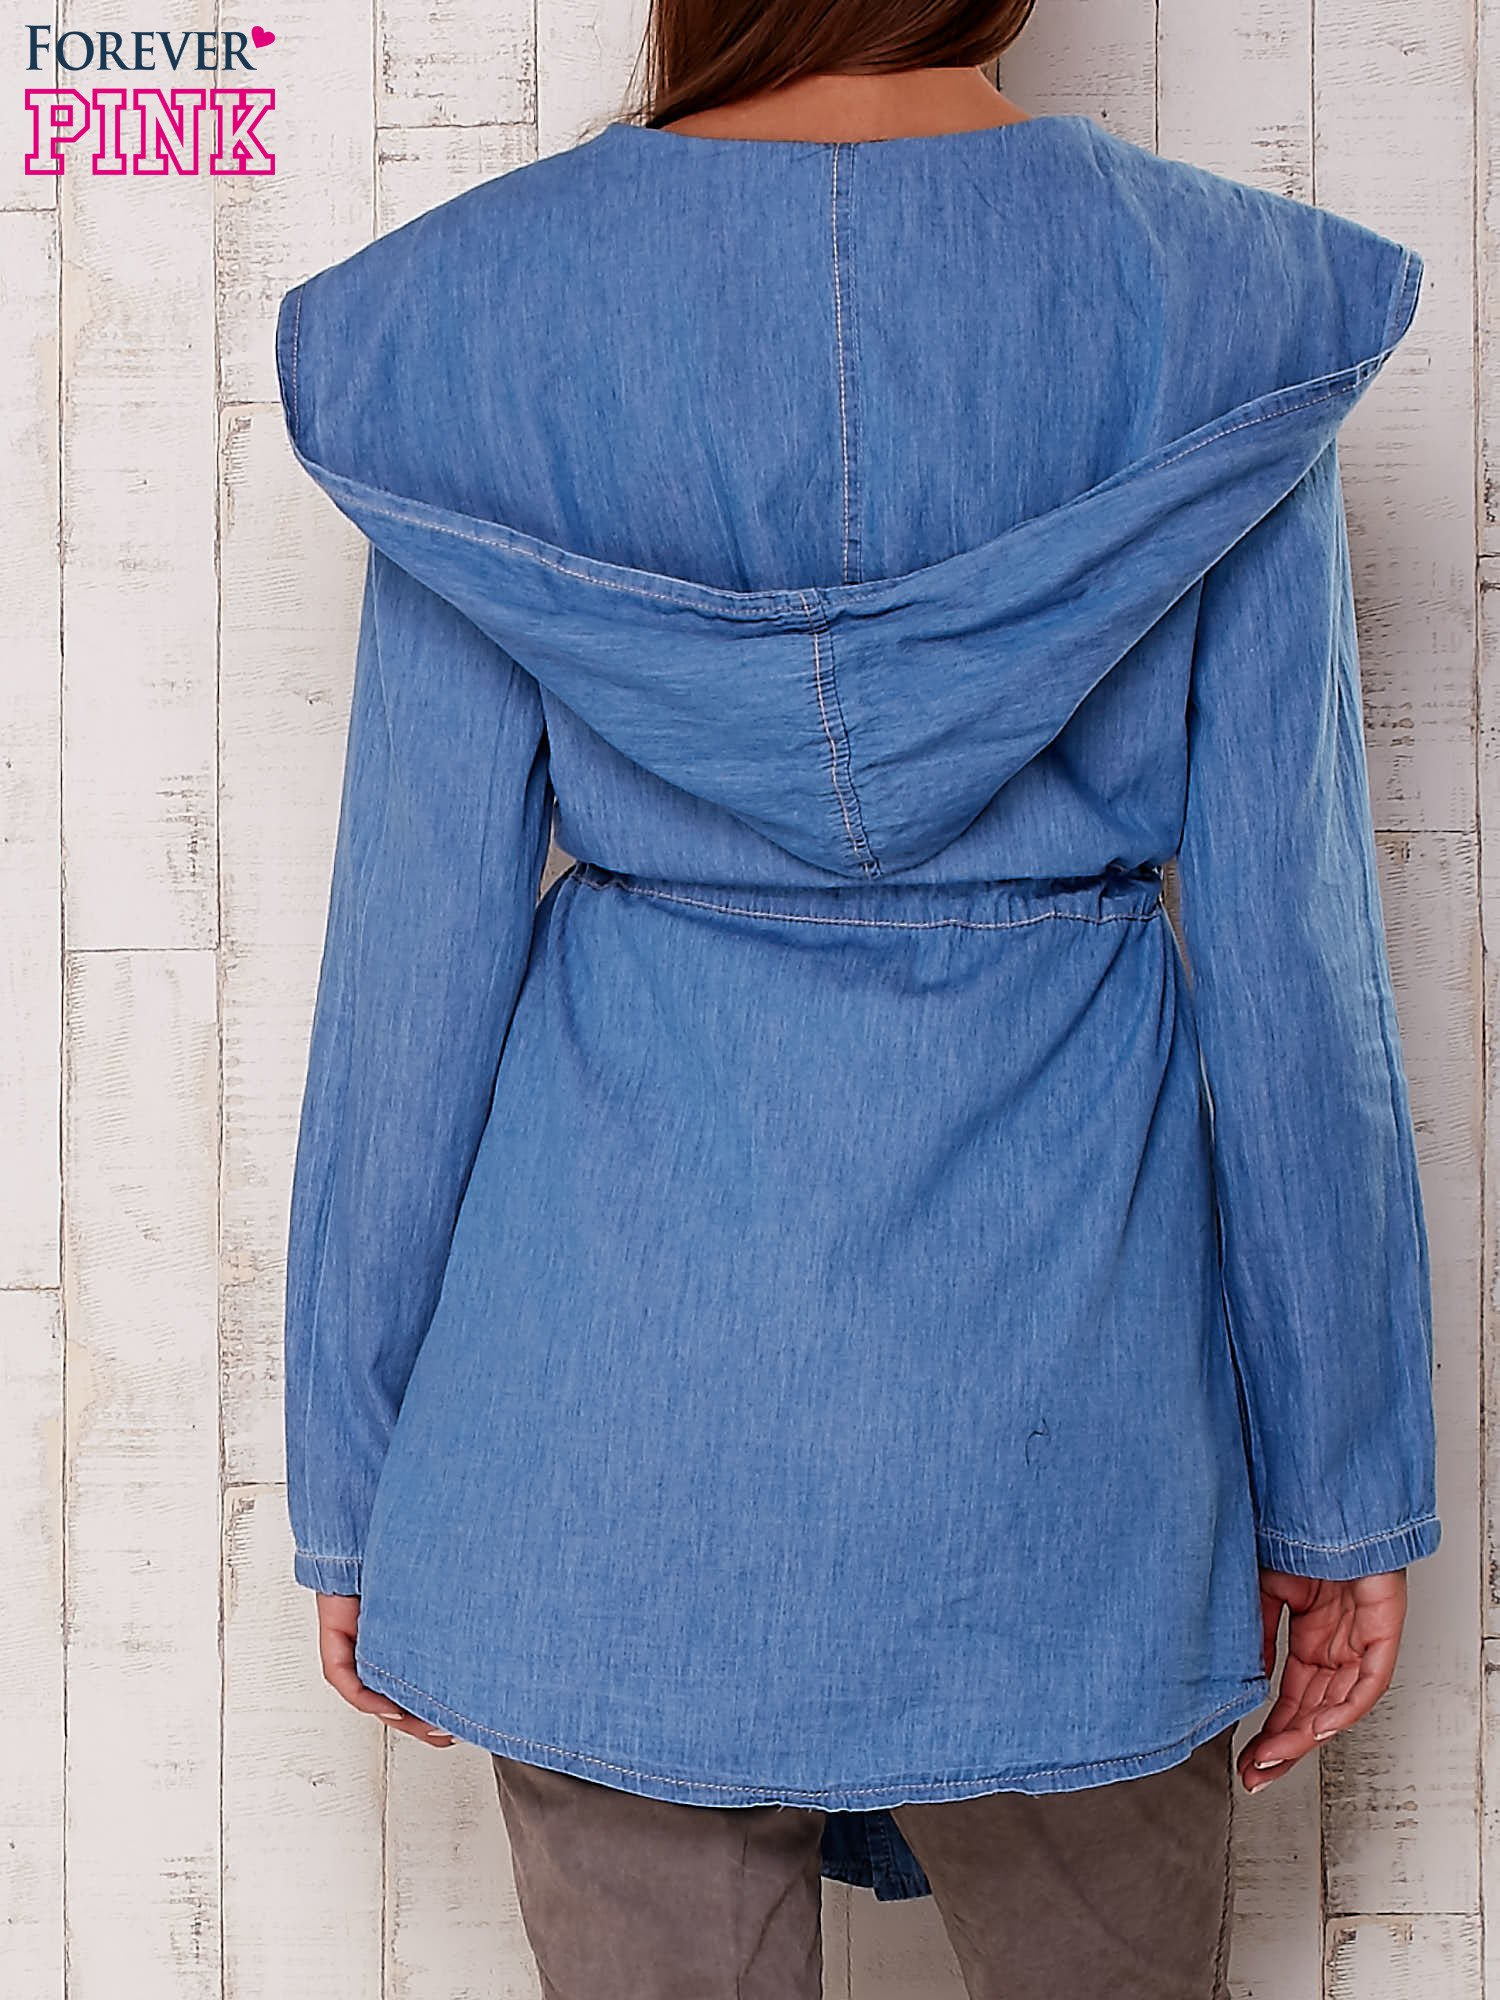 Jasnoniebieska jeansowa koszula narzutka z kapturem                                  zdj.                                  2